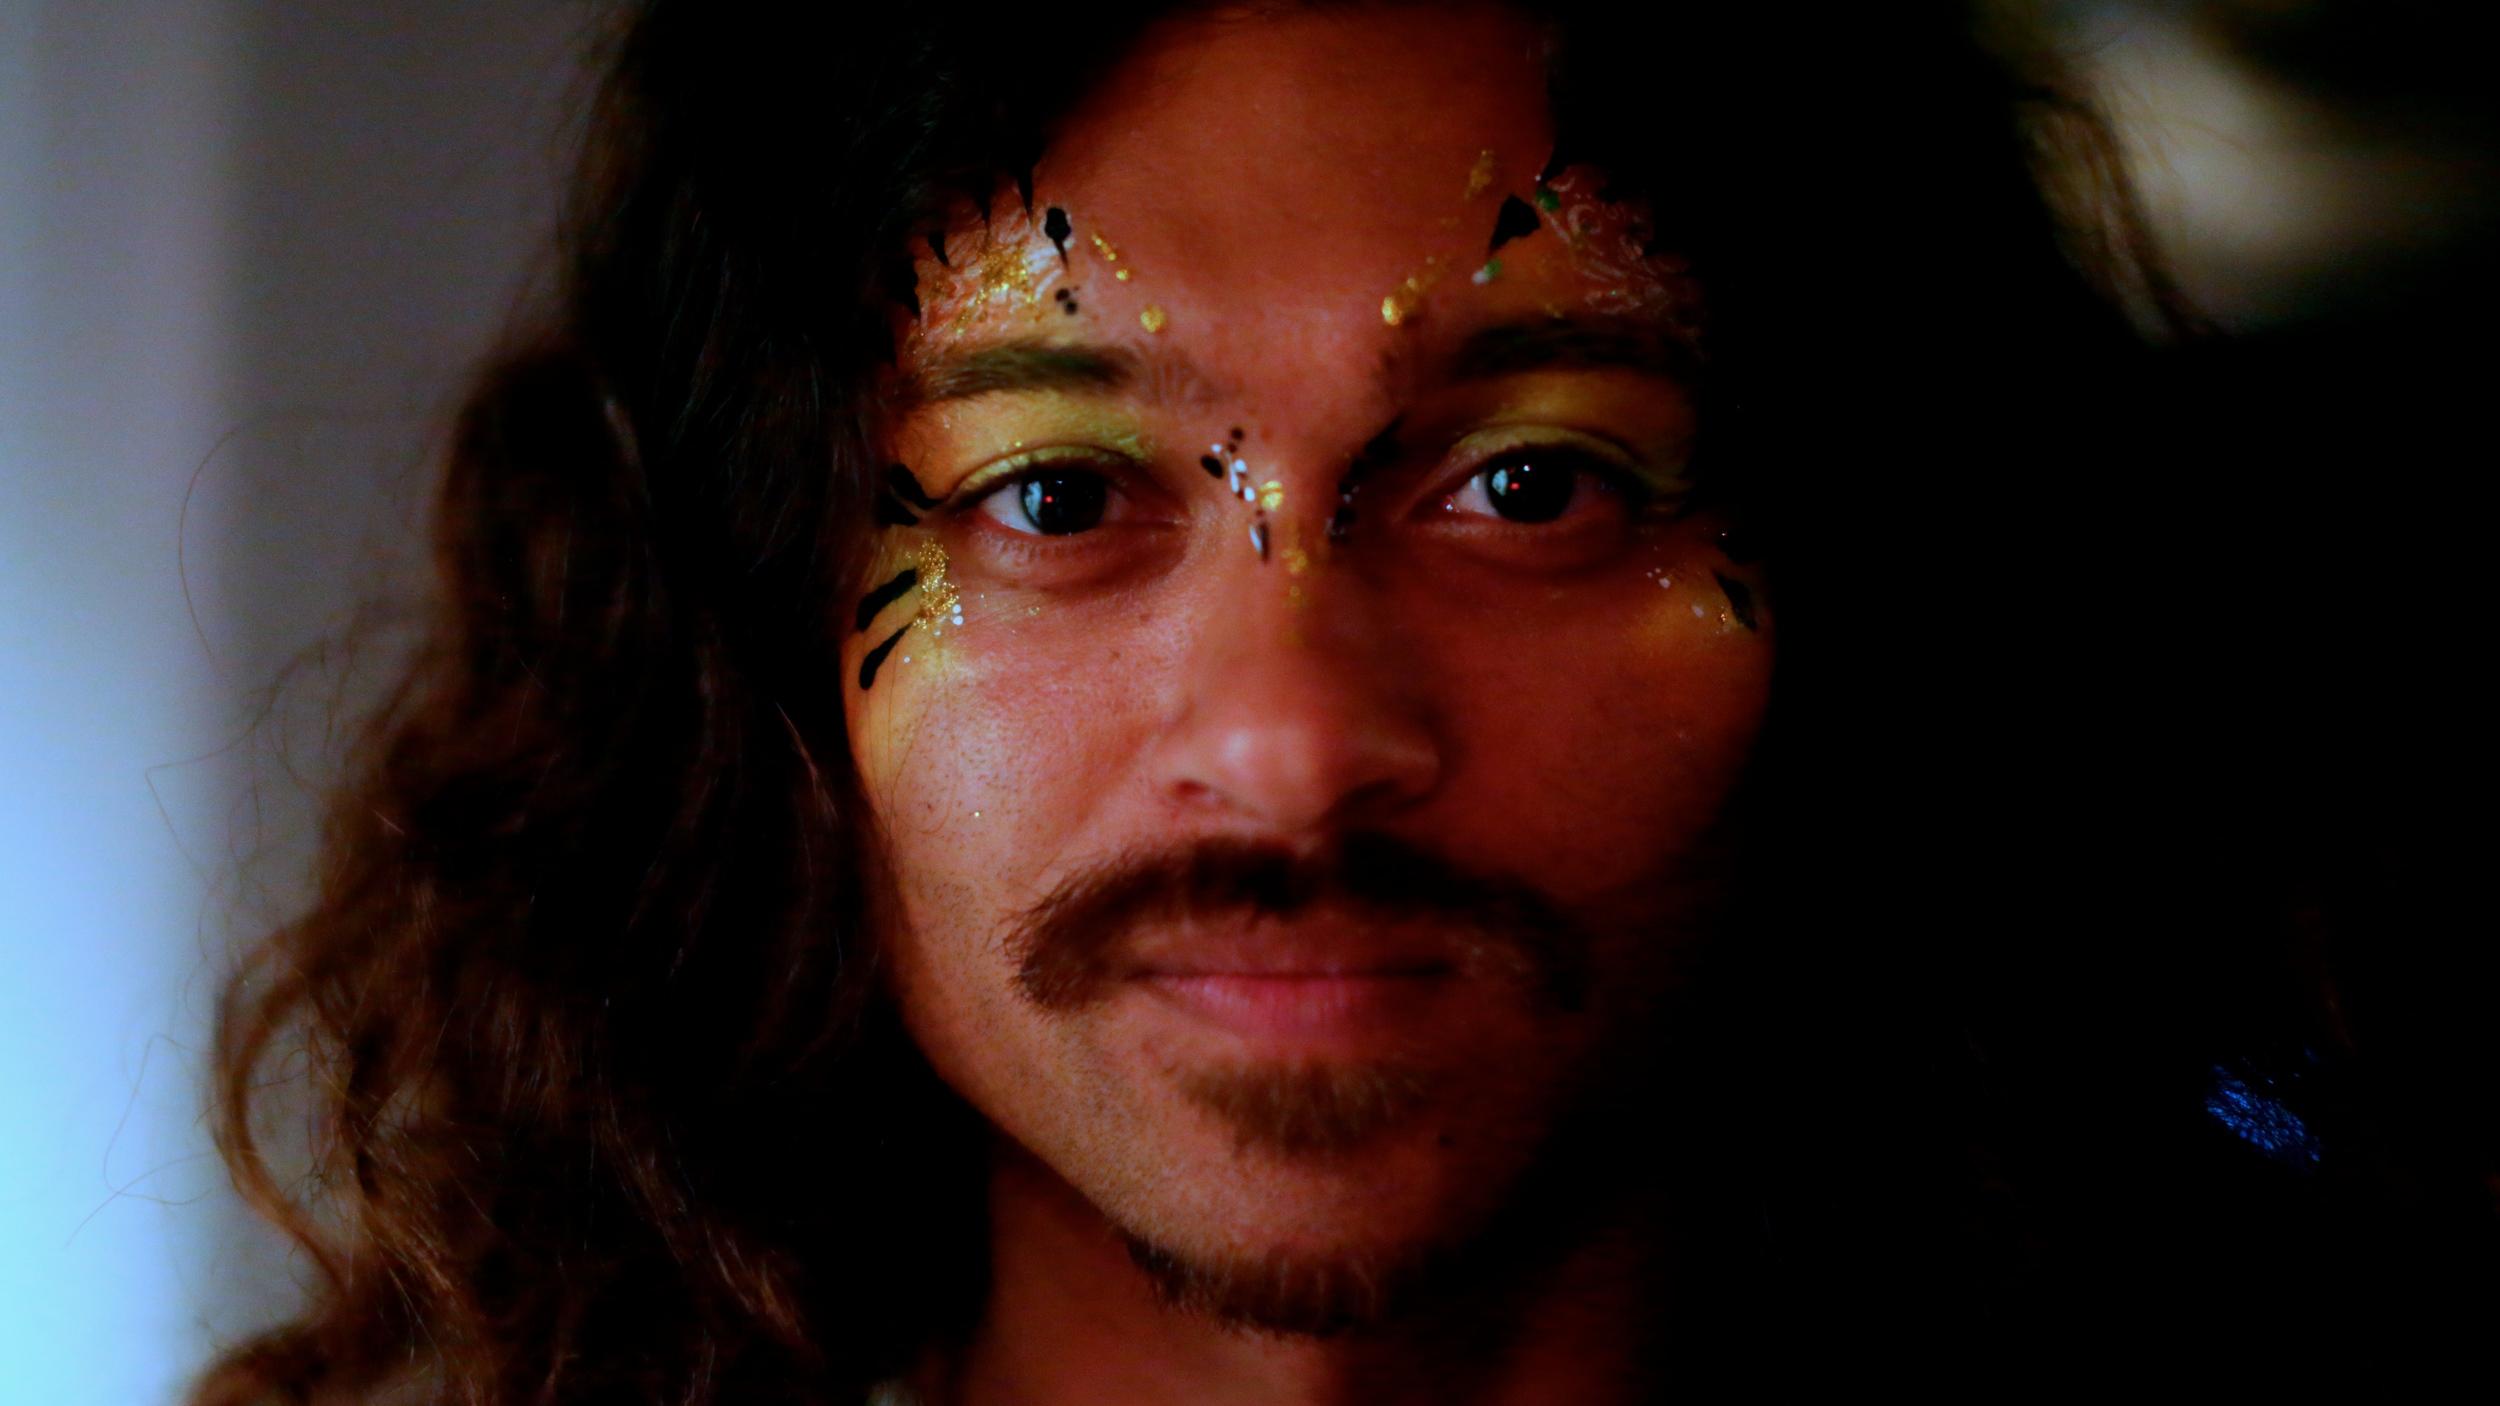 Carioca Face Painting